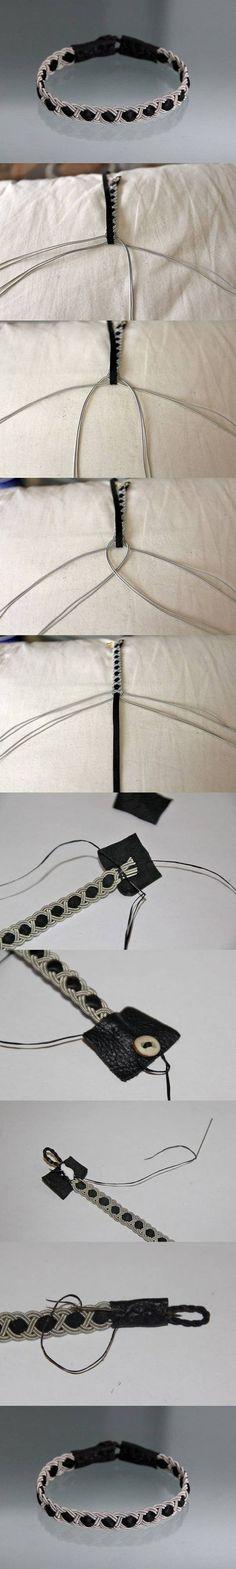 DIY Jewelry: DIY Cute Wristband cute crafts diy easy crafts diy ideas diy crafts do it yourse Macrame Jewelry, Wire Jewelry, Jewelry Crafts, Jewelery, Jewelry Bracelets, Handmade Jewelry, Wrap Bracelets, Wire Rings, Silver Bracelets